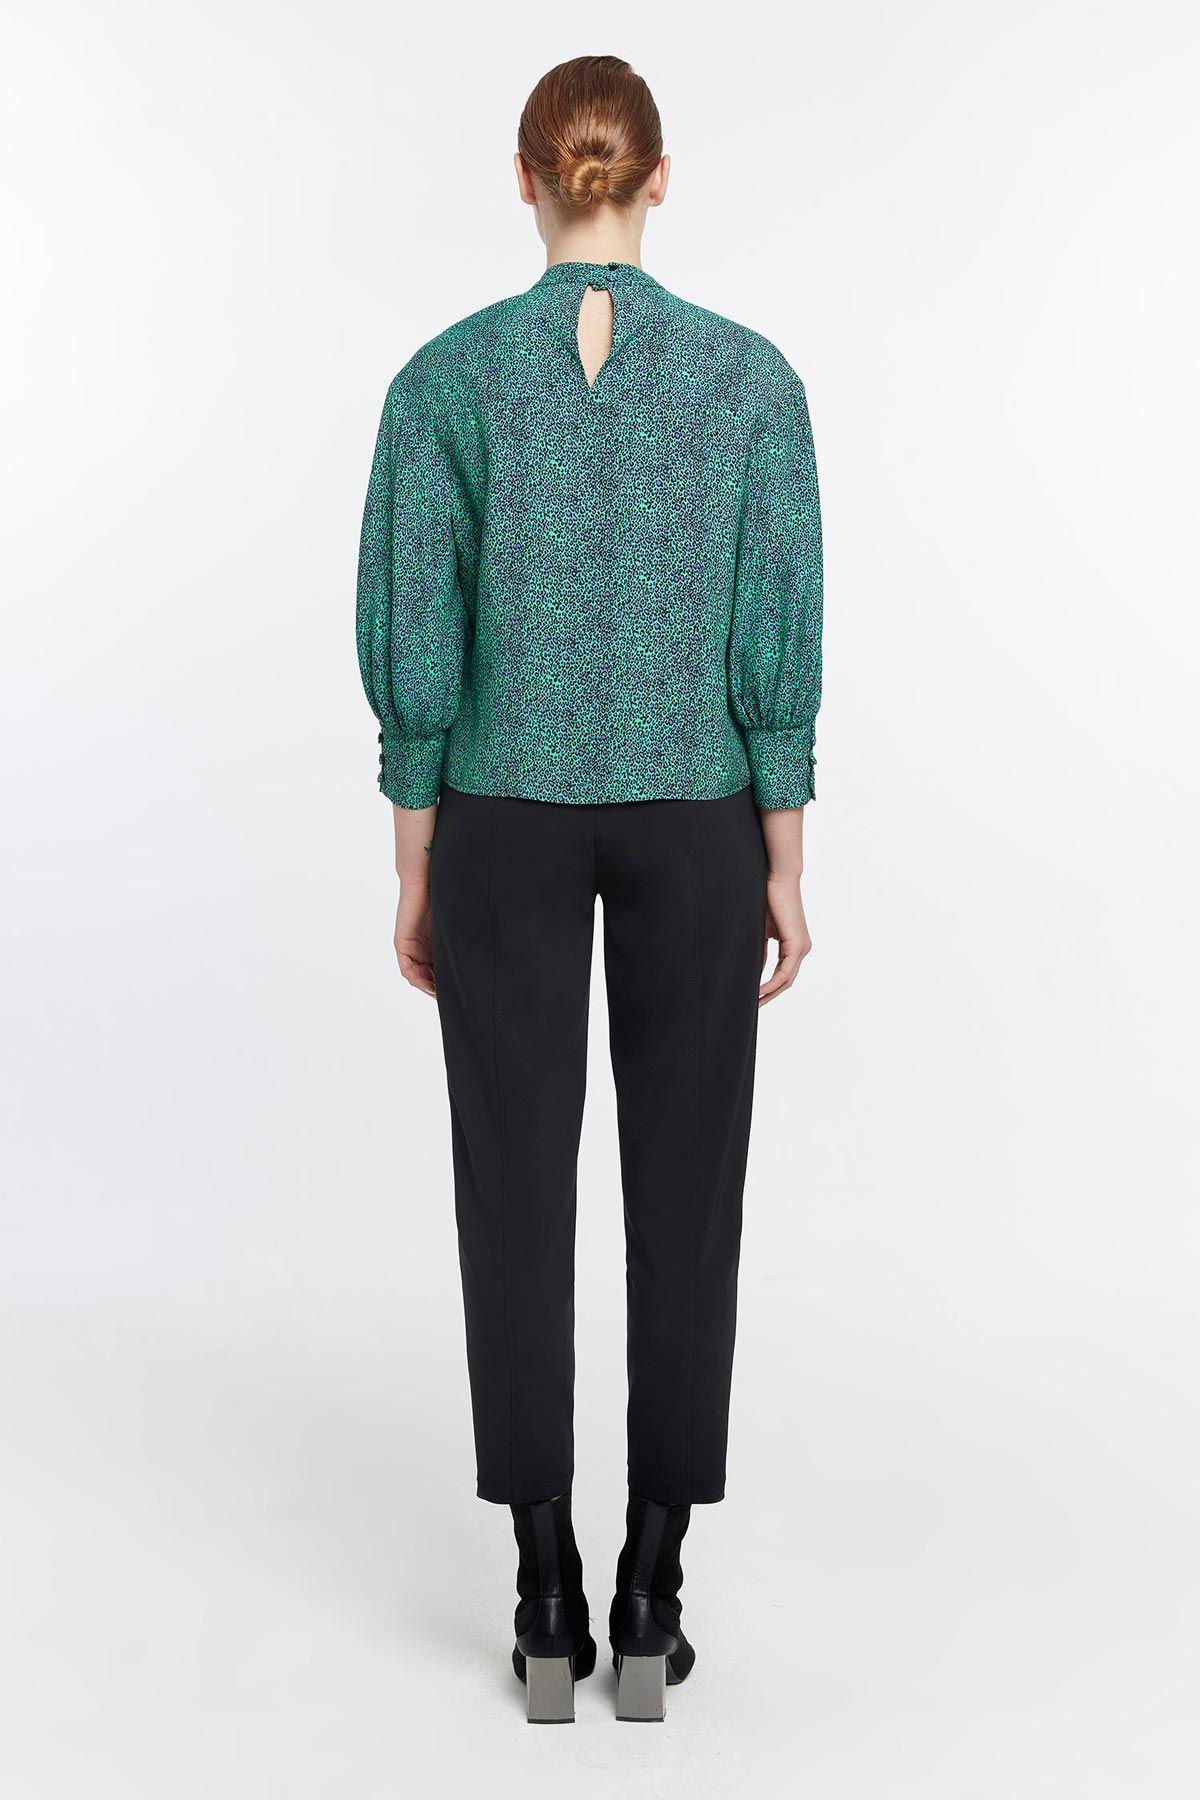 Balon kol leopar desenli bluz Yeşil